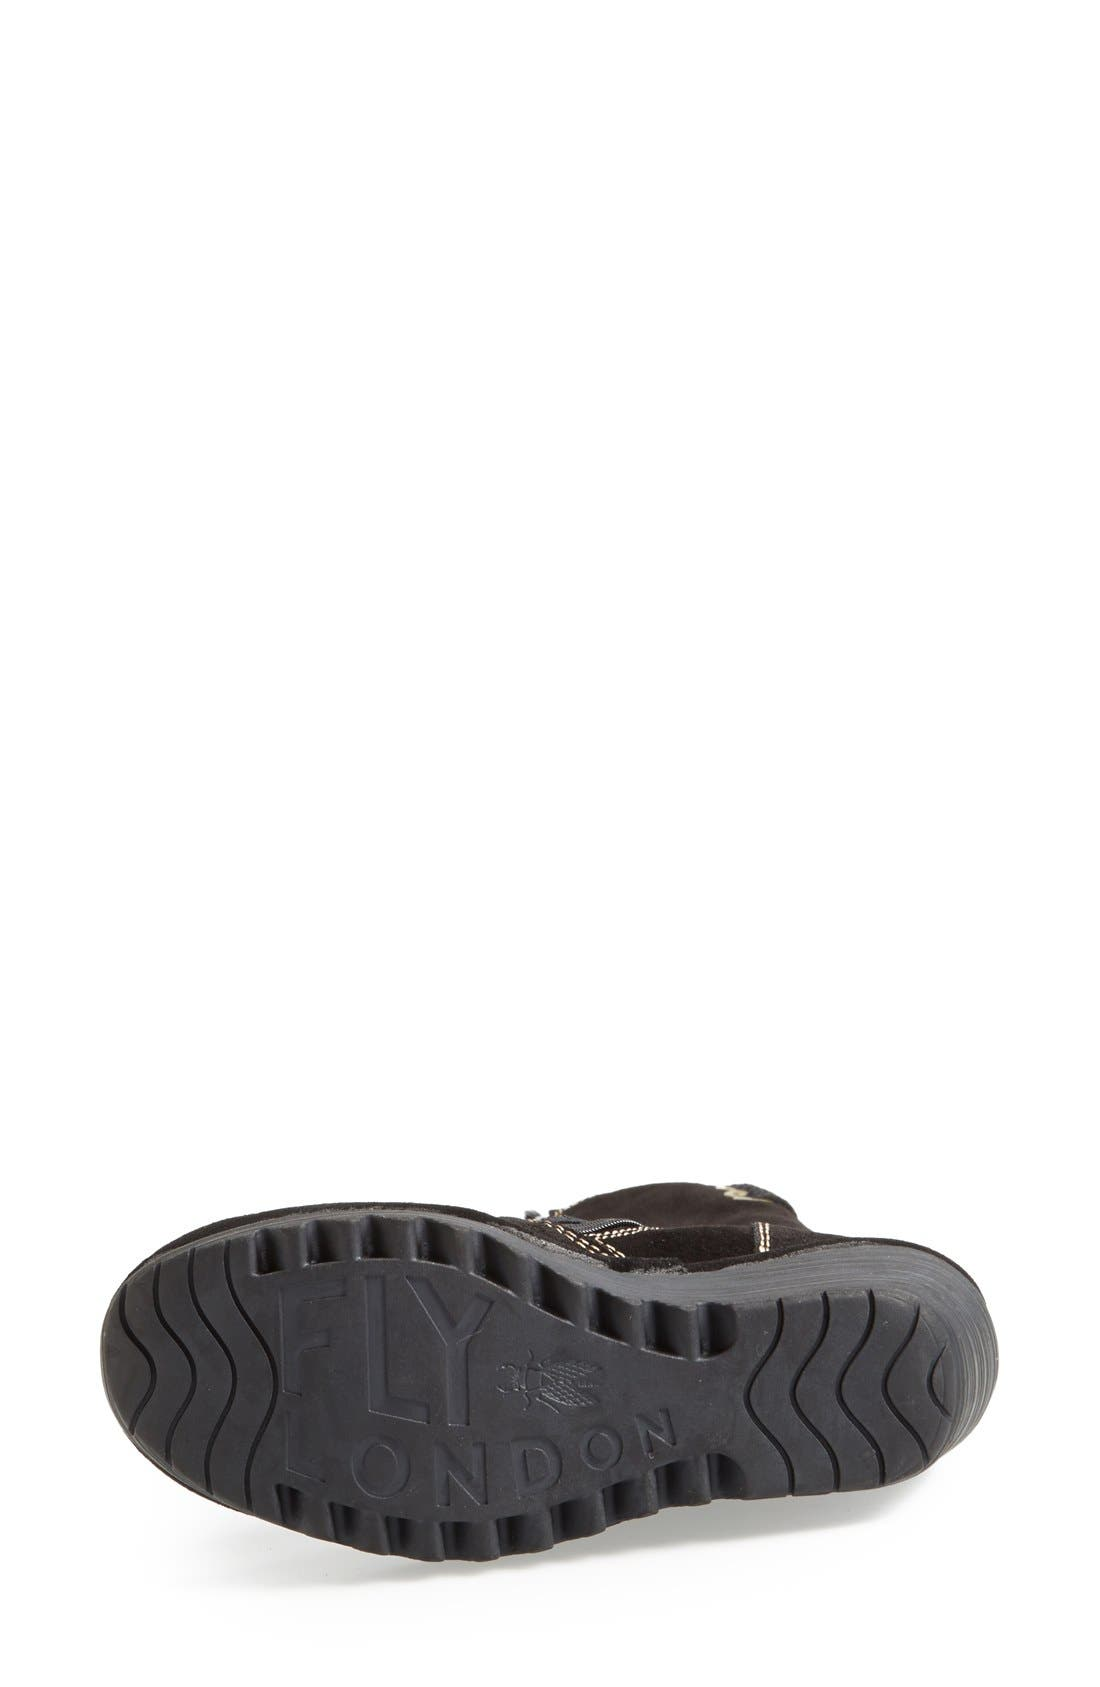 'Yust' Knee High Platform Wedge Boot,                             Alternate thumbnail 4, color,                             Black Suede